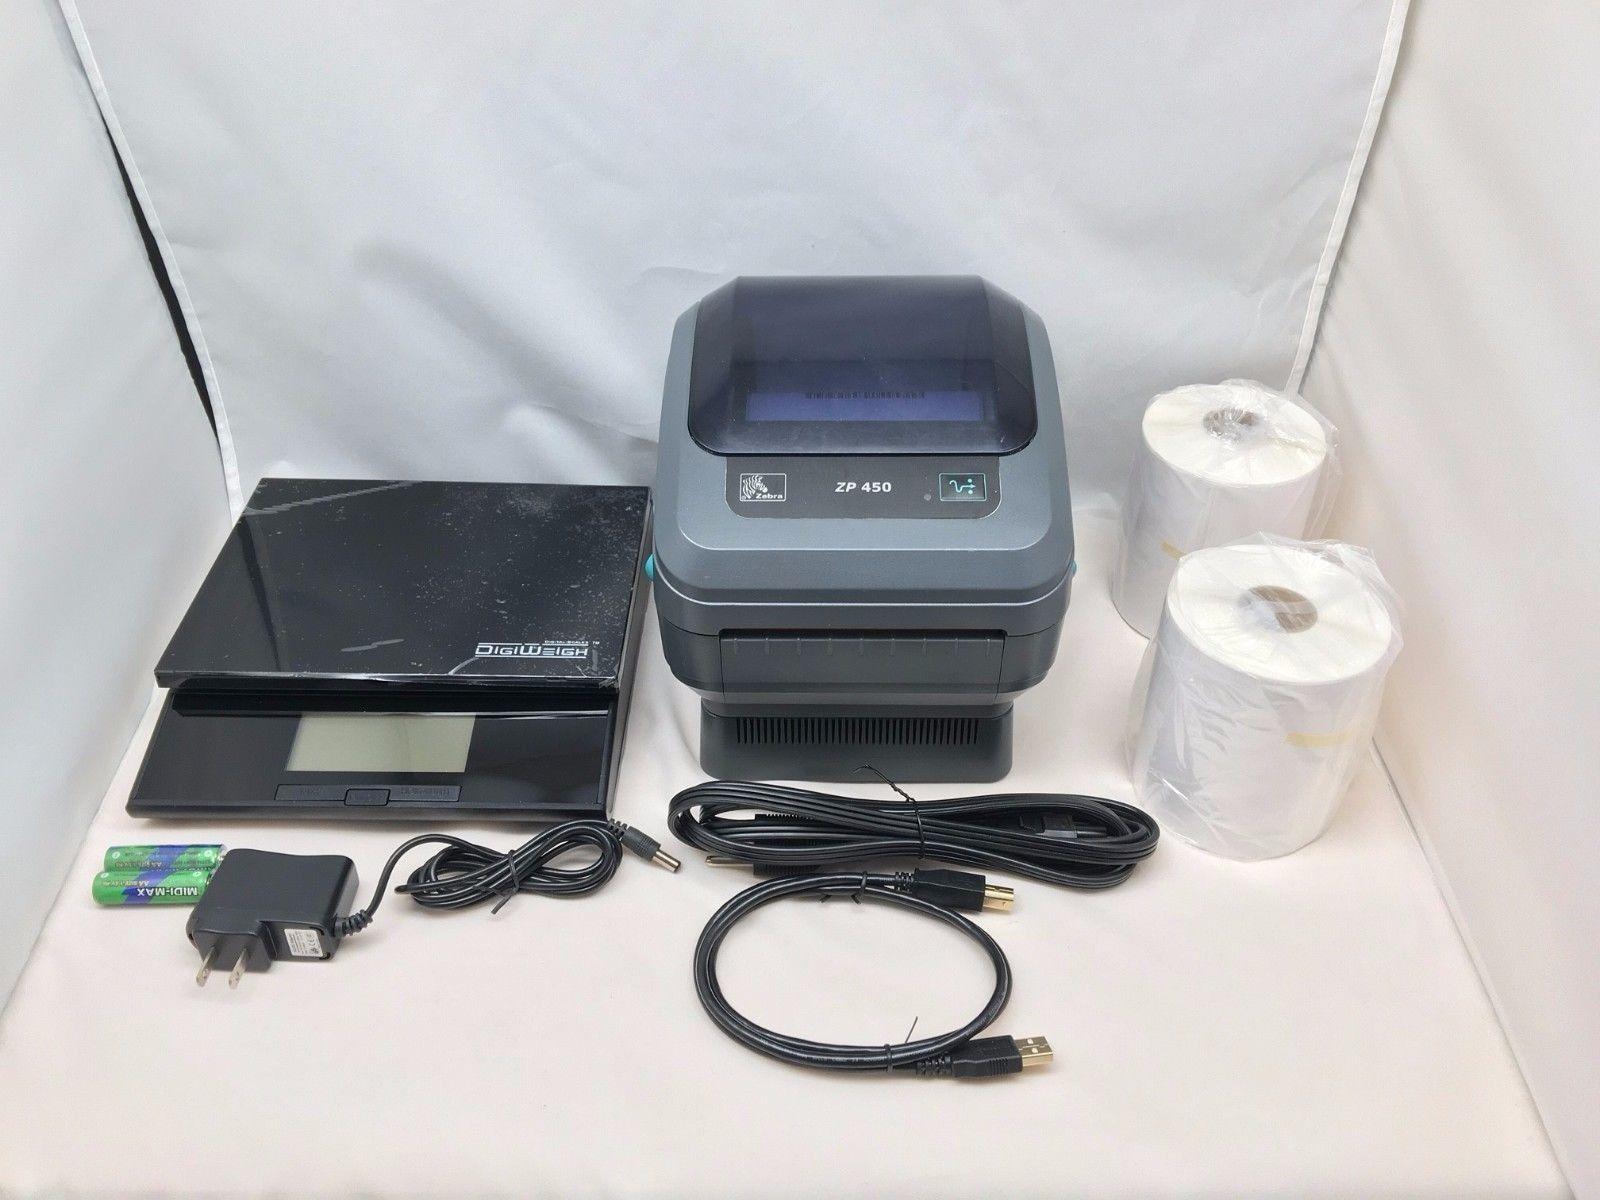 Zebra ZP450 Barcode Printer Digital Postal and 50 similar items